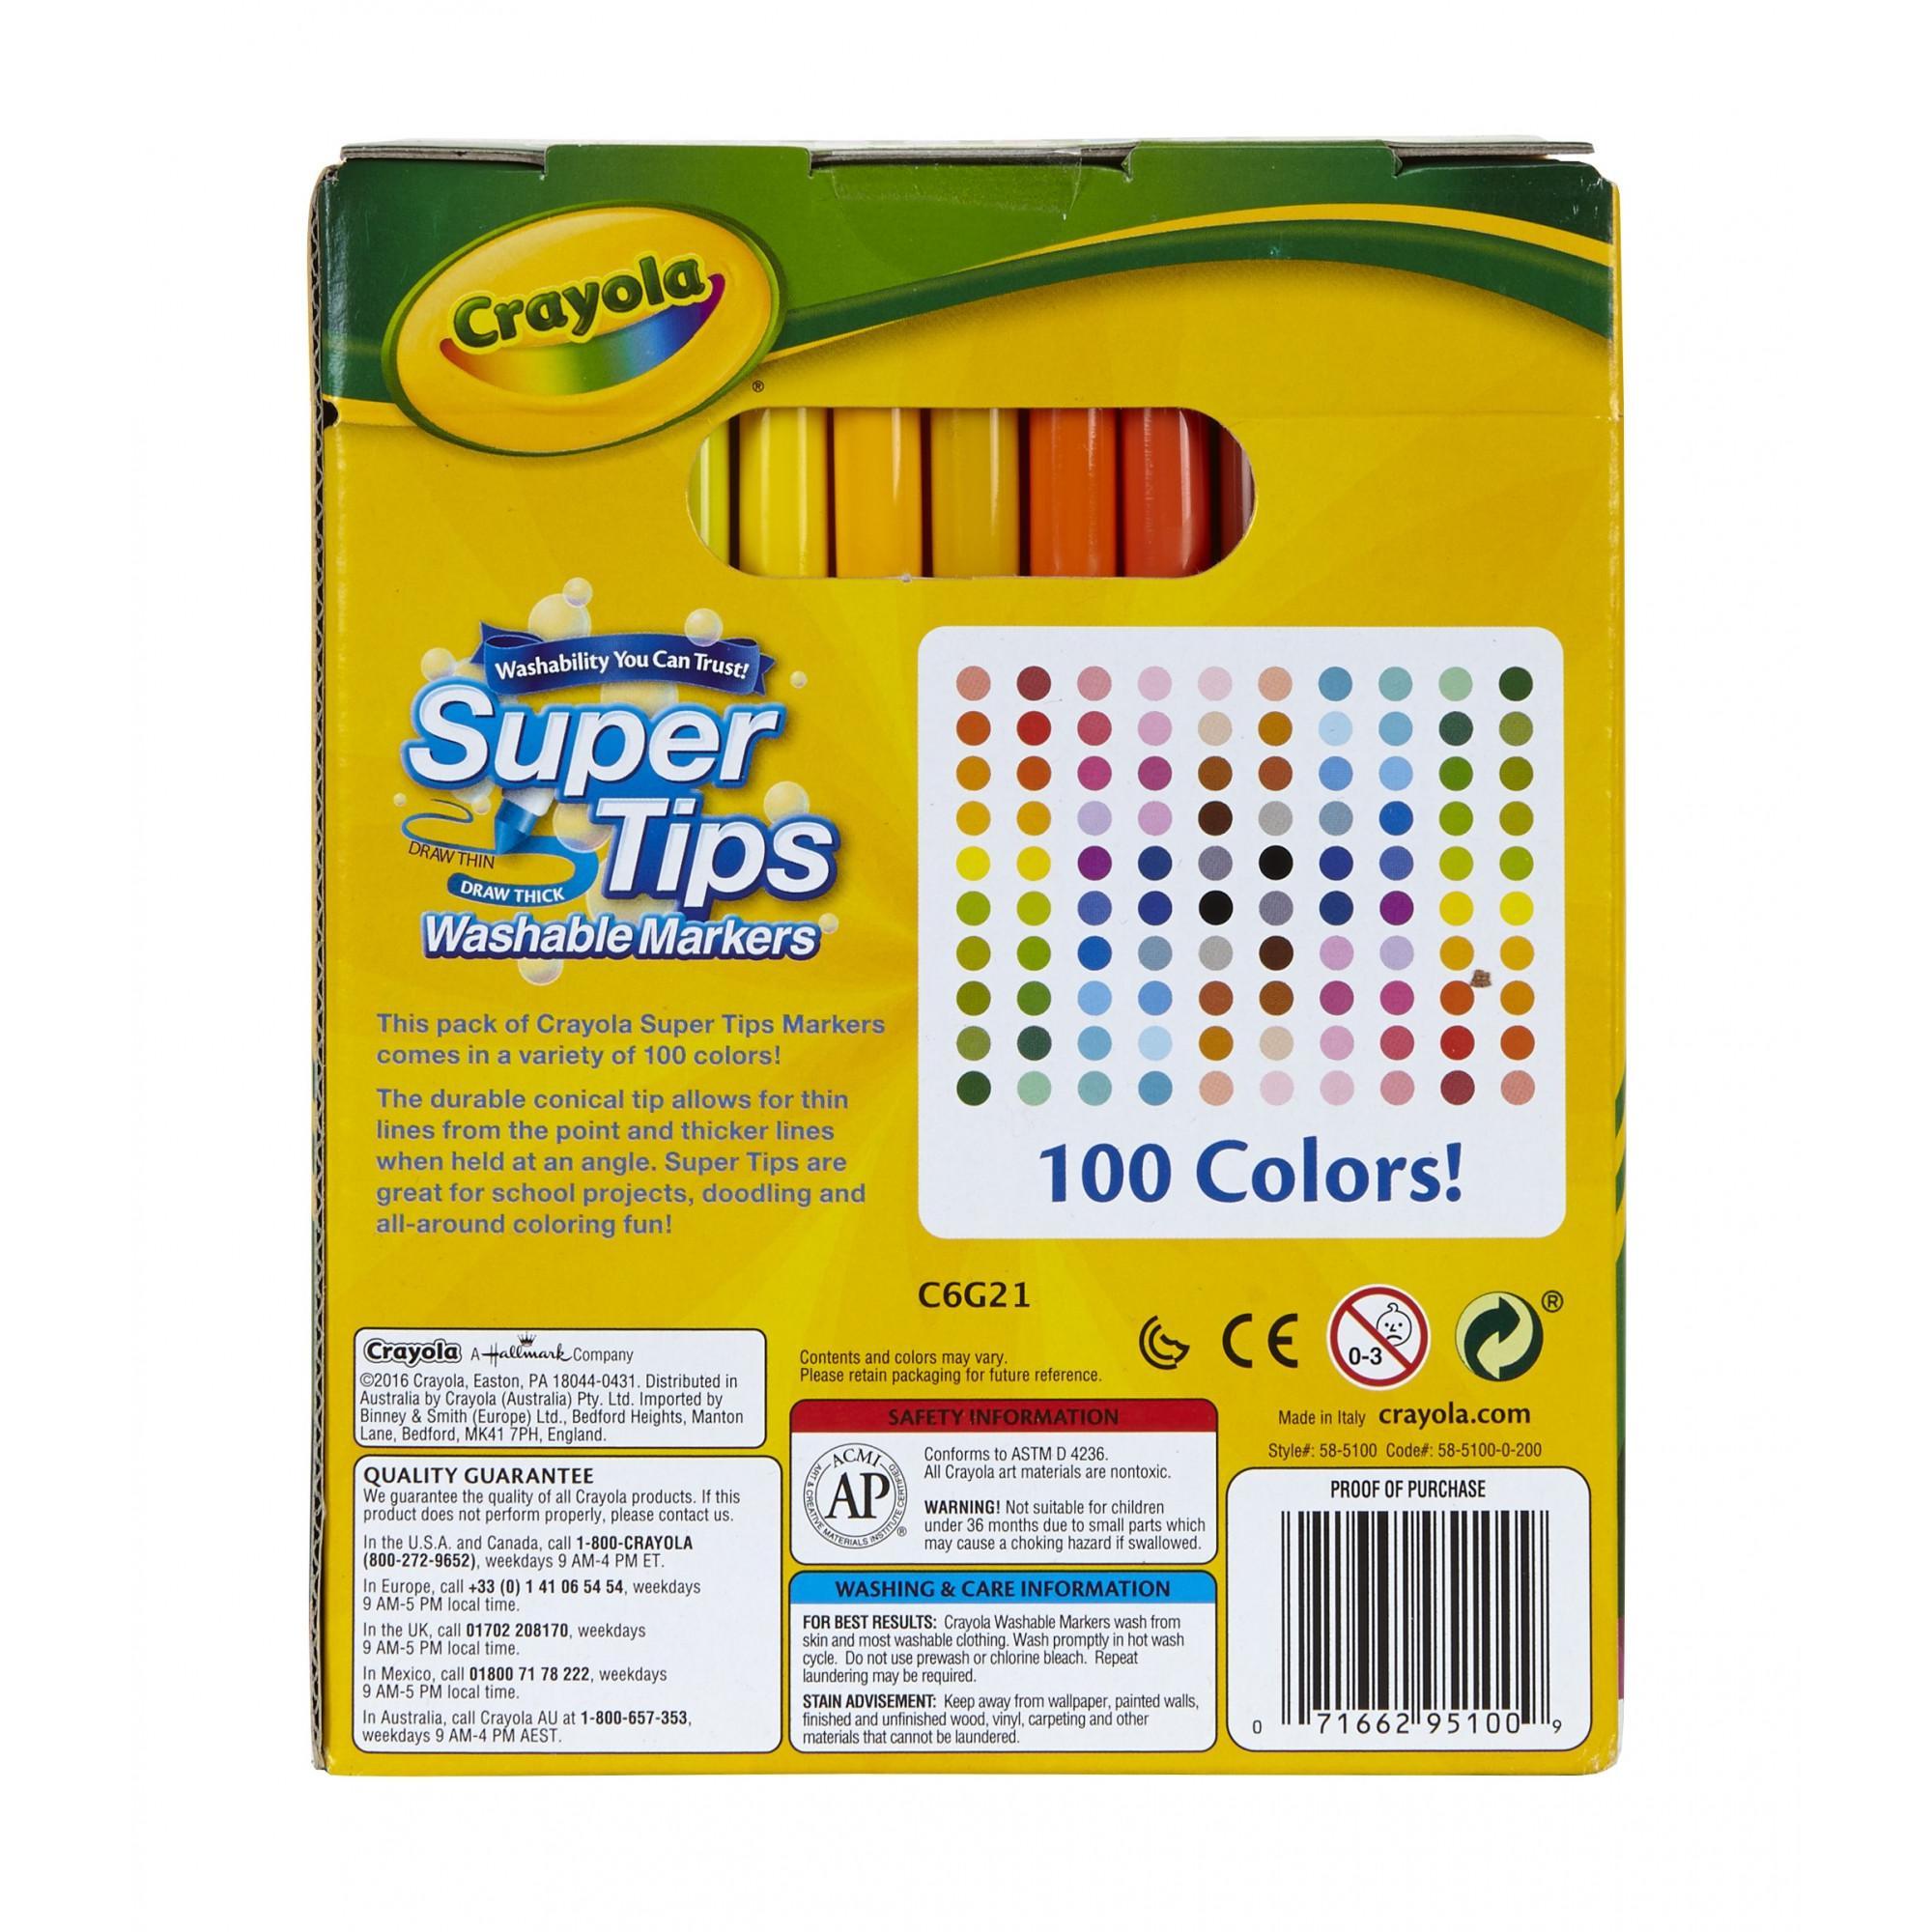 Multicoloured 17.78 x 14.73 x 8.63 cm Crayola Super Tips Washable Markers